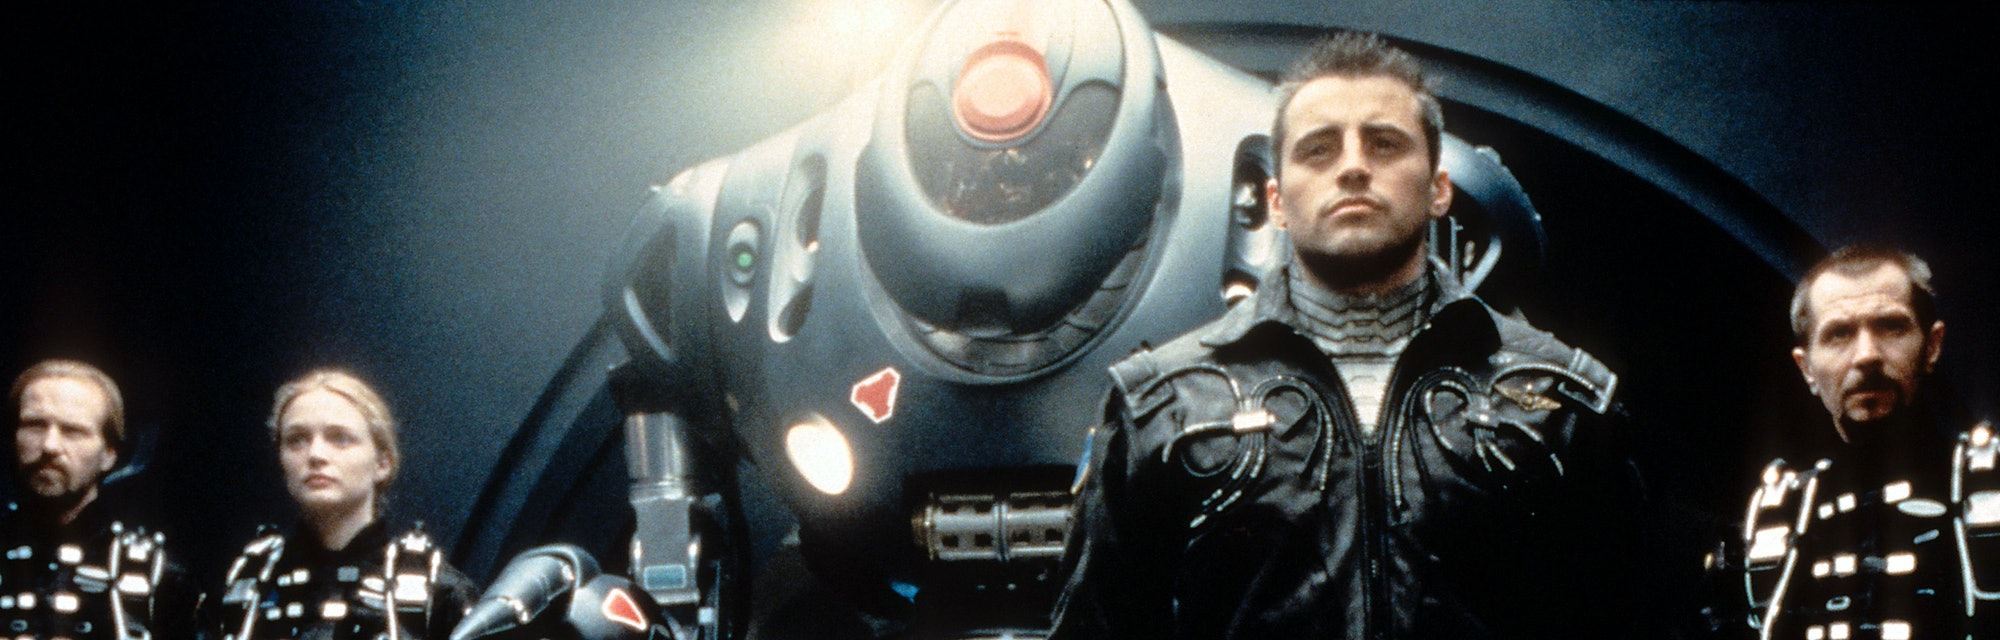 Gary Oldman, William Hurt, Heather Graham and Matt LeBlanc standing with a space machine in a scene ...